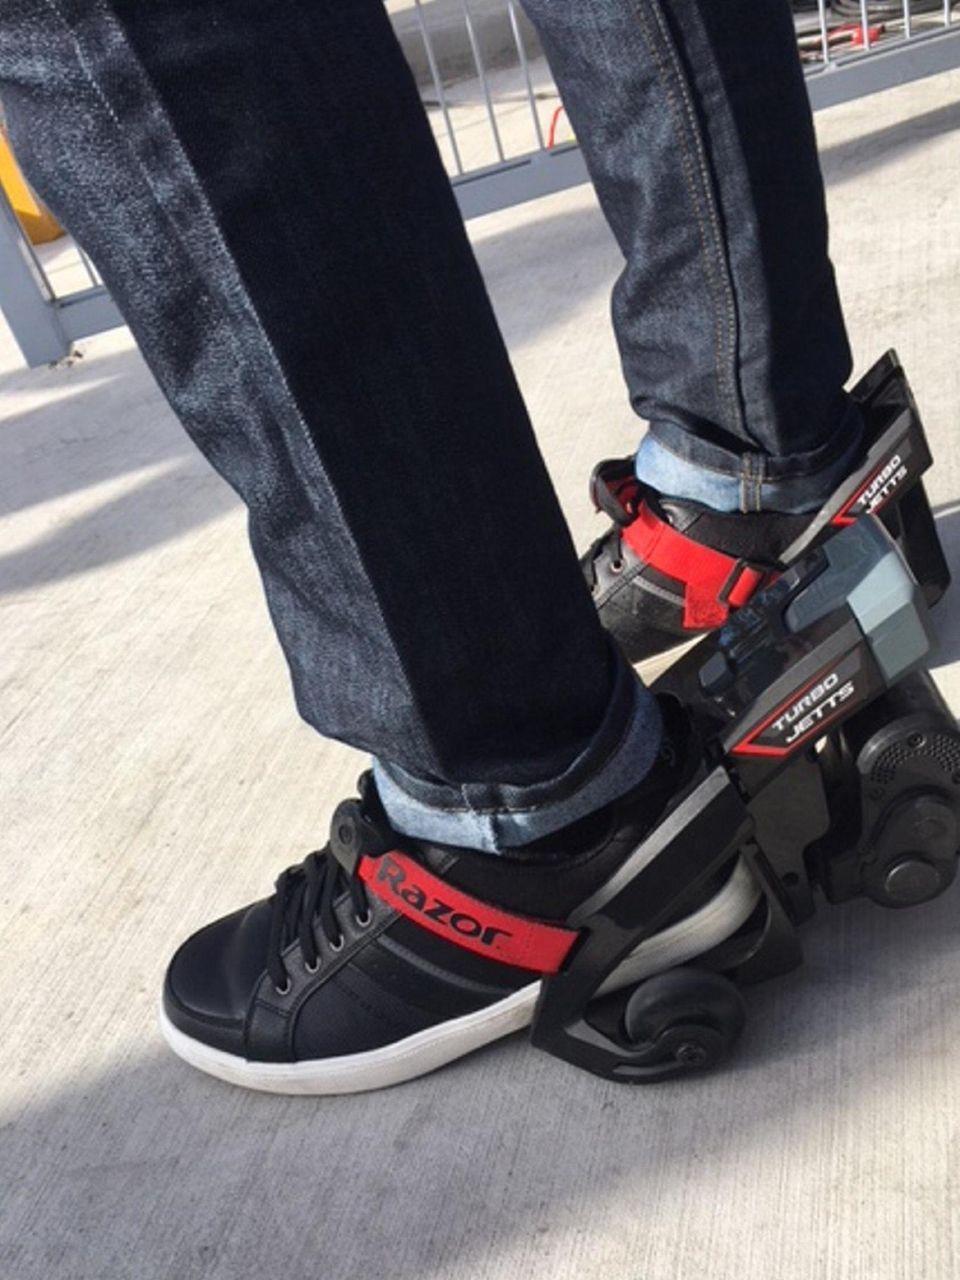 The Razor Turbo Jetts are electric motorized heel